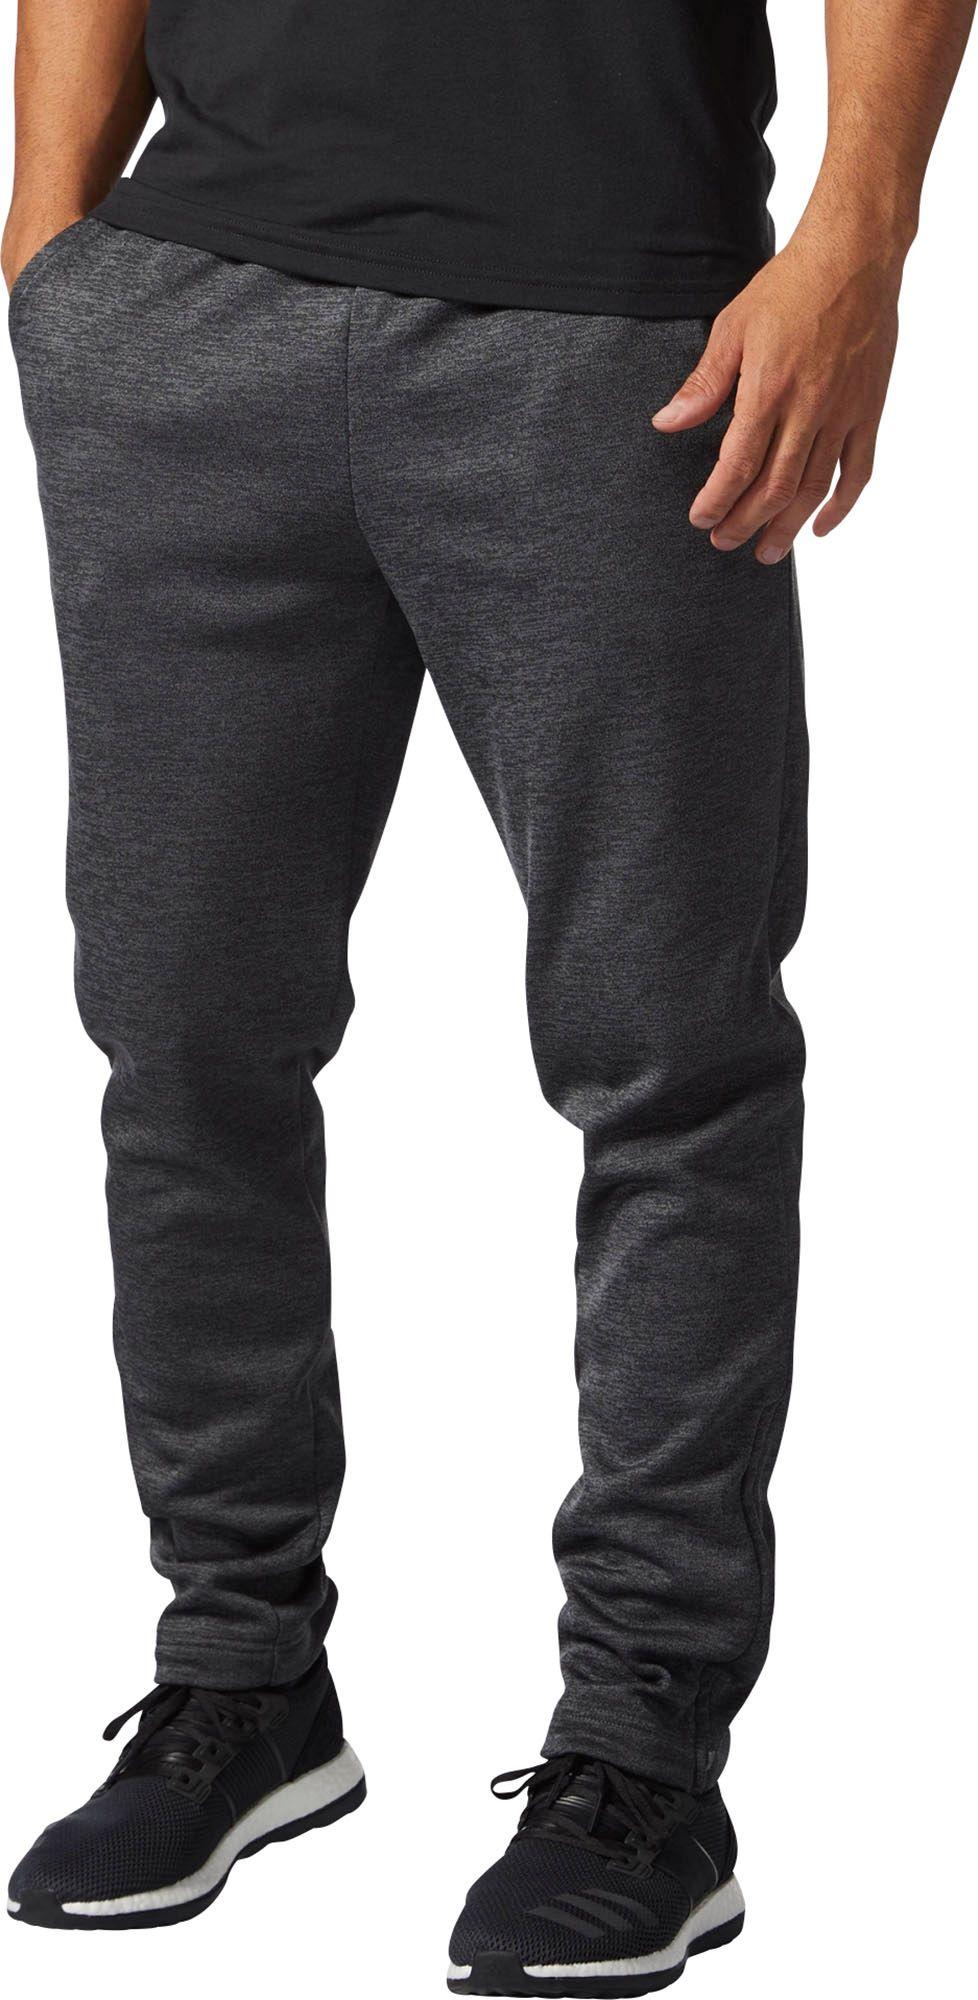 3a7ad80626b2 adidas Men's Athletics Team Issue Fleece Tapered Pants